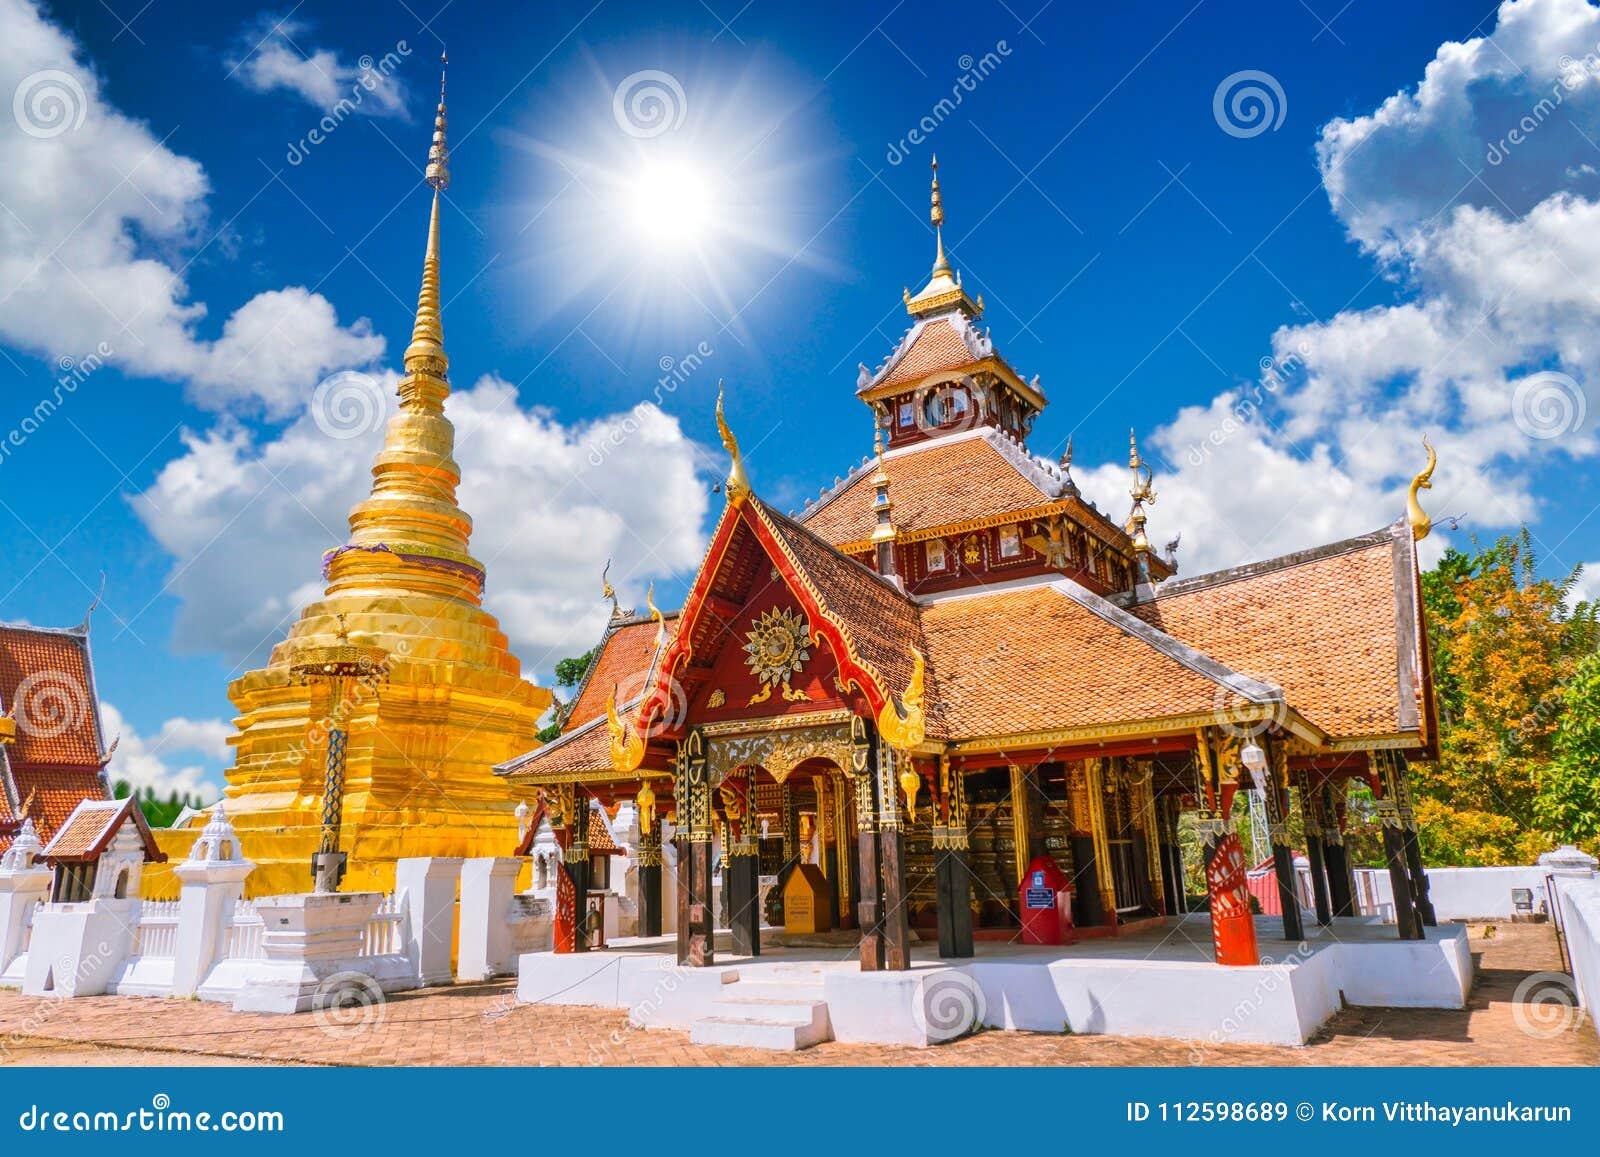 Wat Pong Sanuk Temple em Lampang Lanna Buddhist Temple antiga bonita